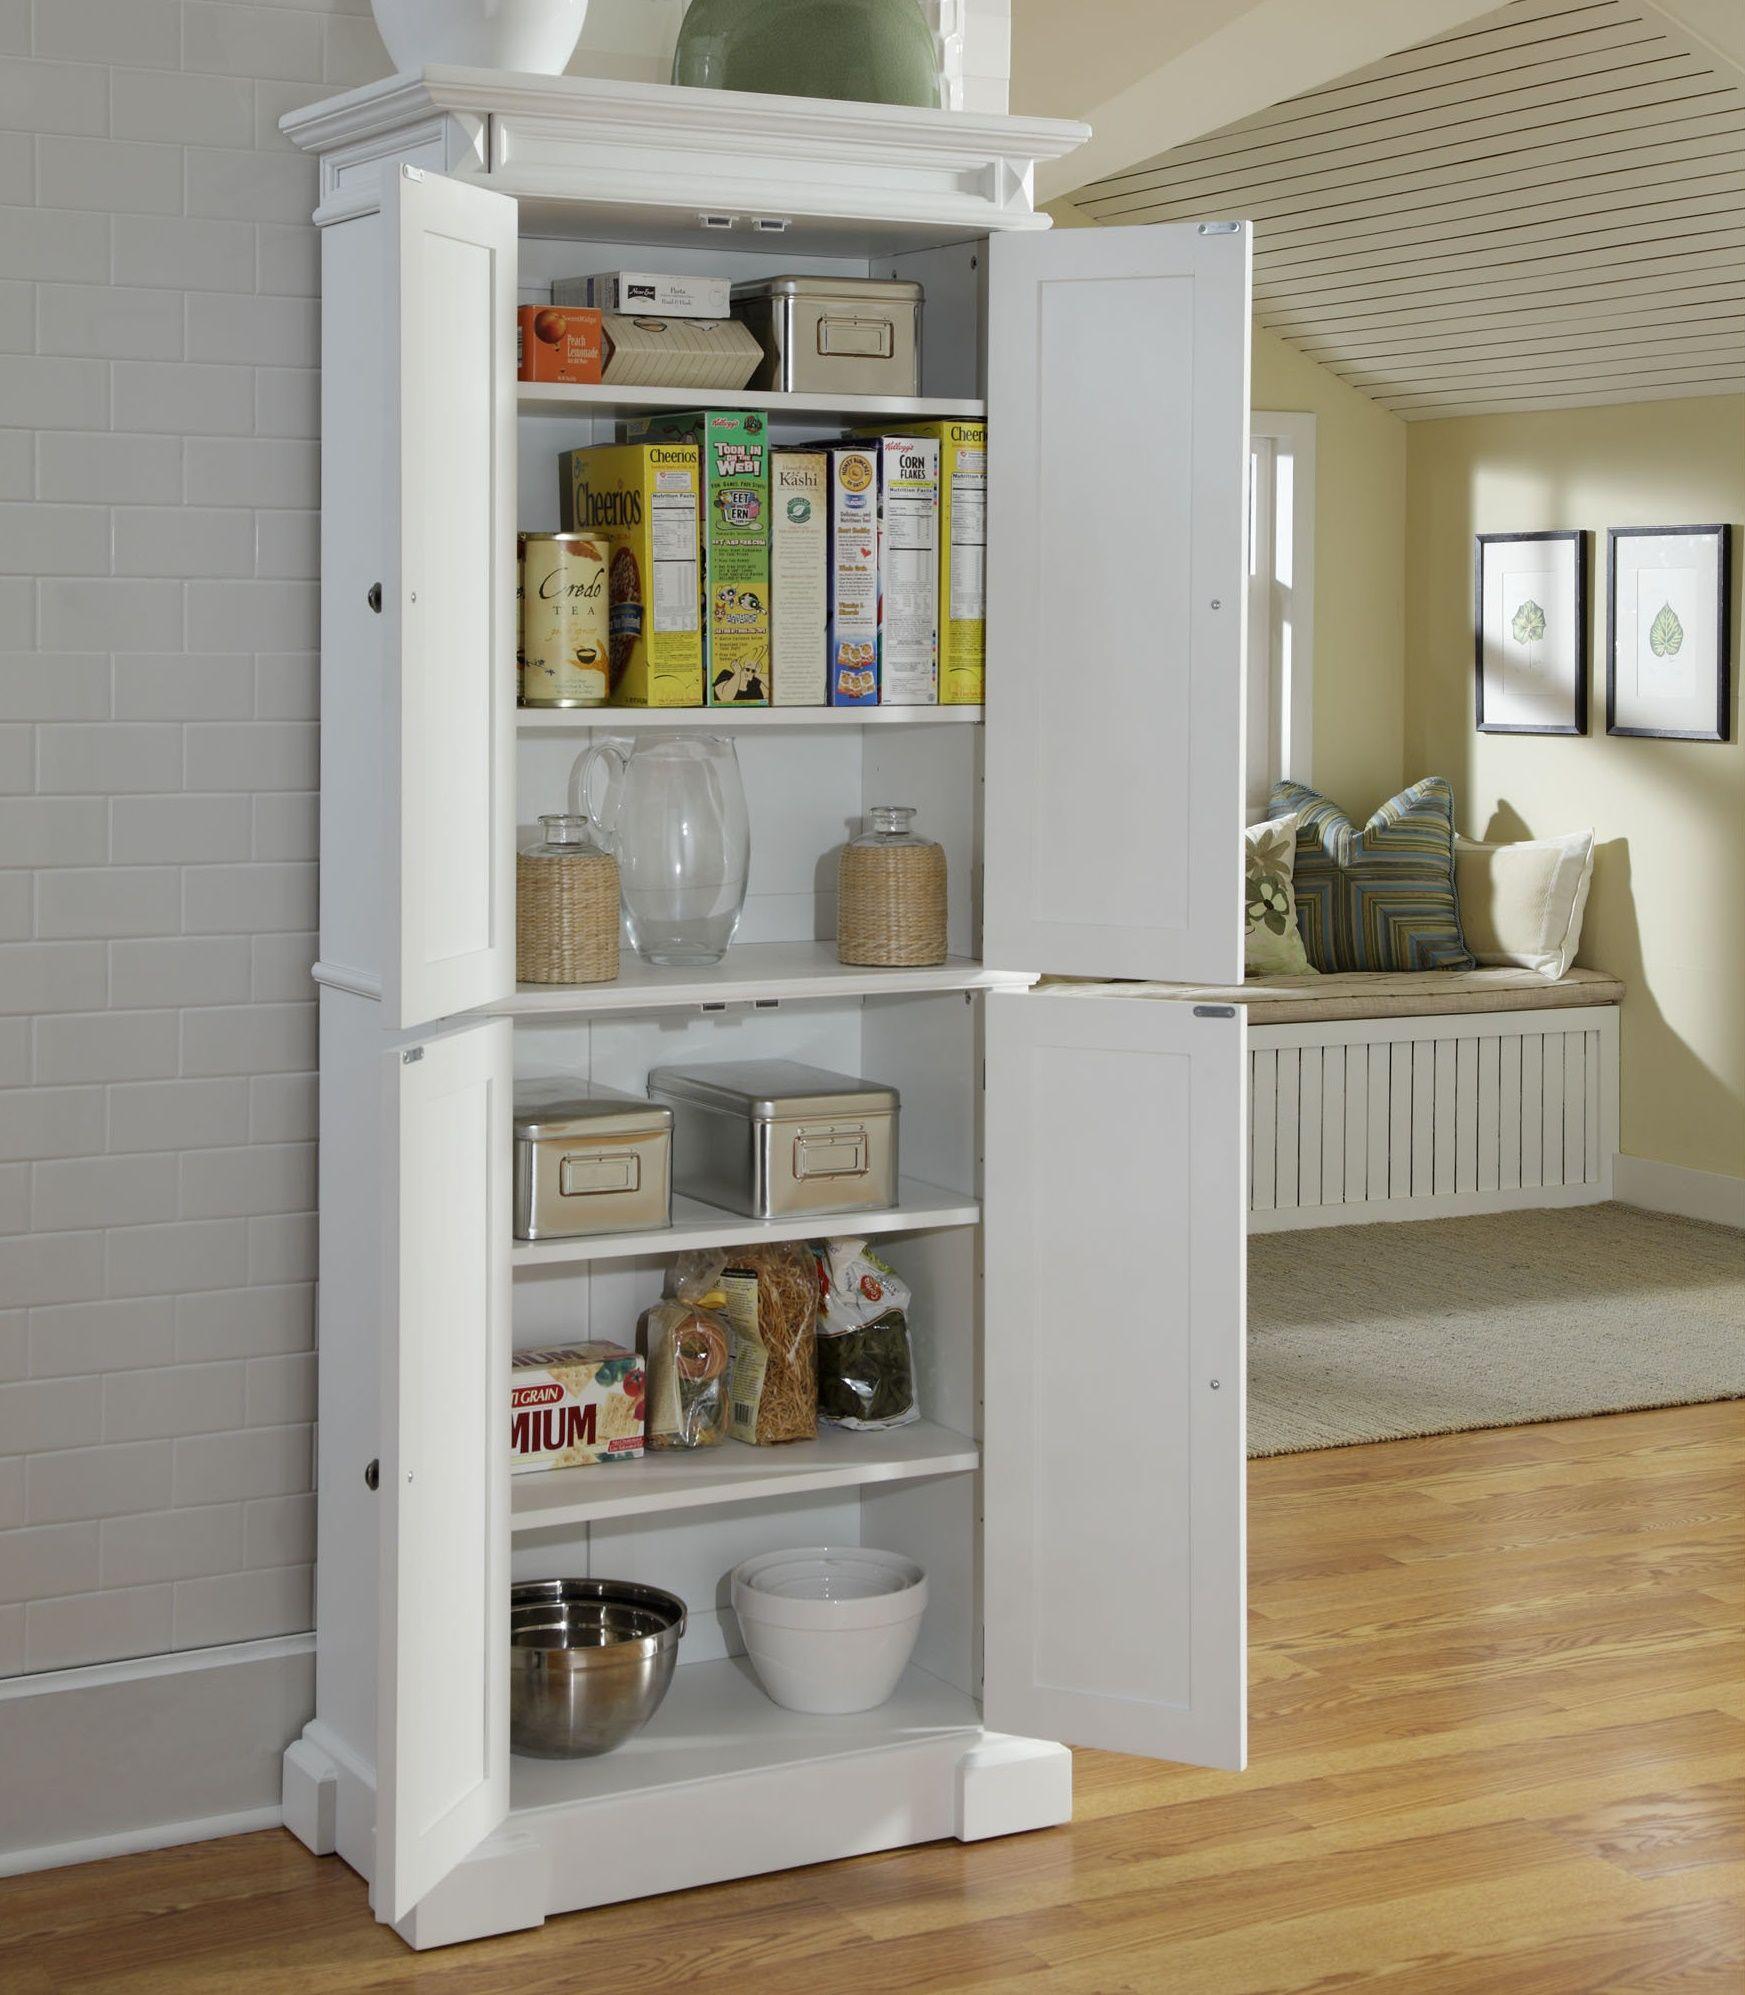 lowes bathroom storage shelves kitchen pantry cabinet pantry storage cabinet white kitchen on kitchen cabinets organization layout id=69596